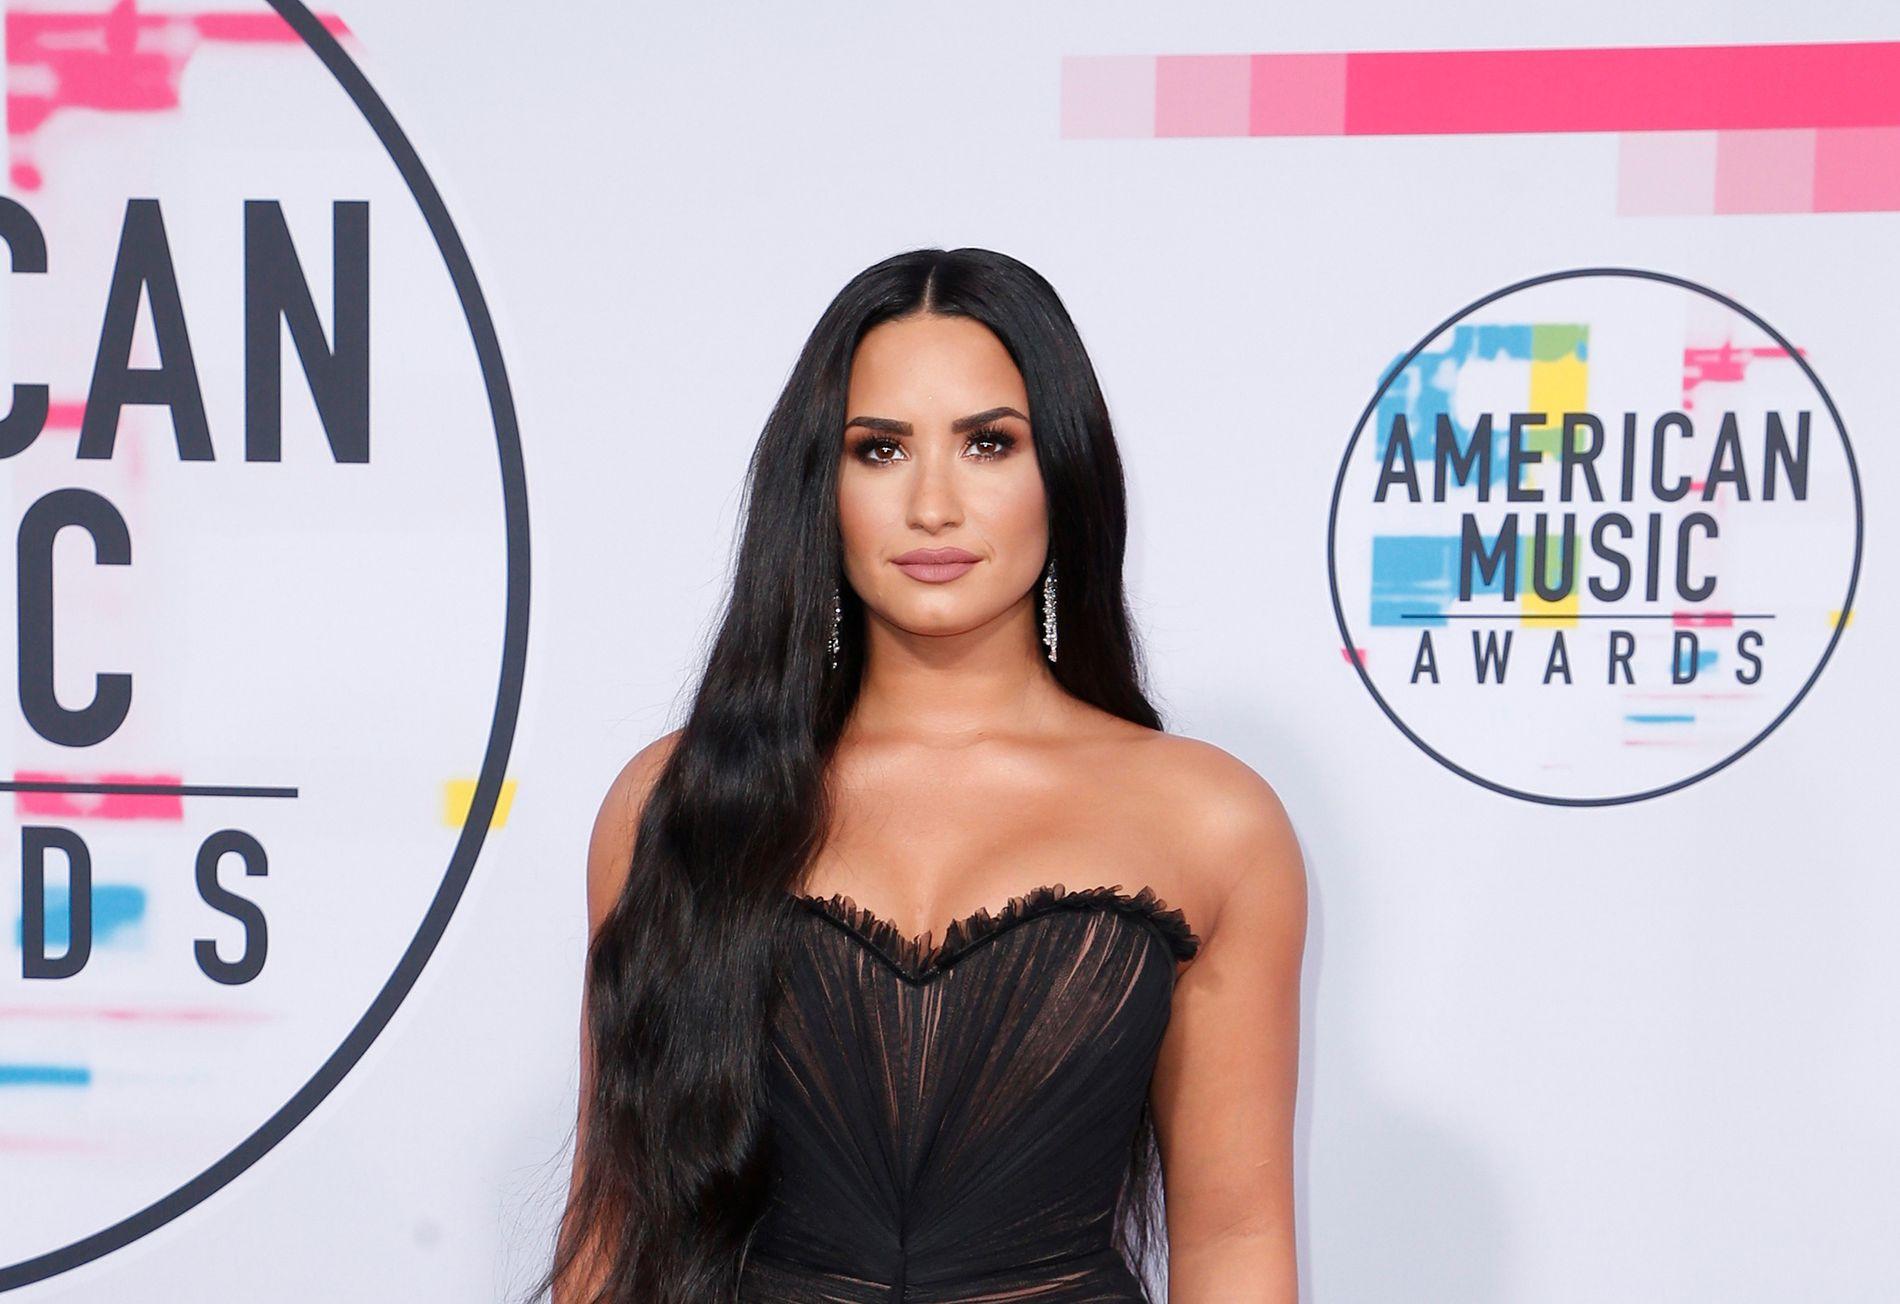 ANKLAGES: Demi Lovato på American Music Awards i Los Angeles 19. november.